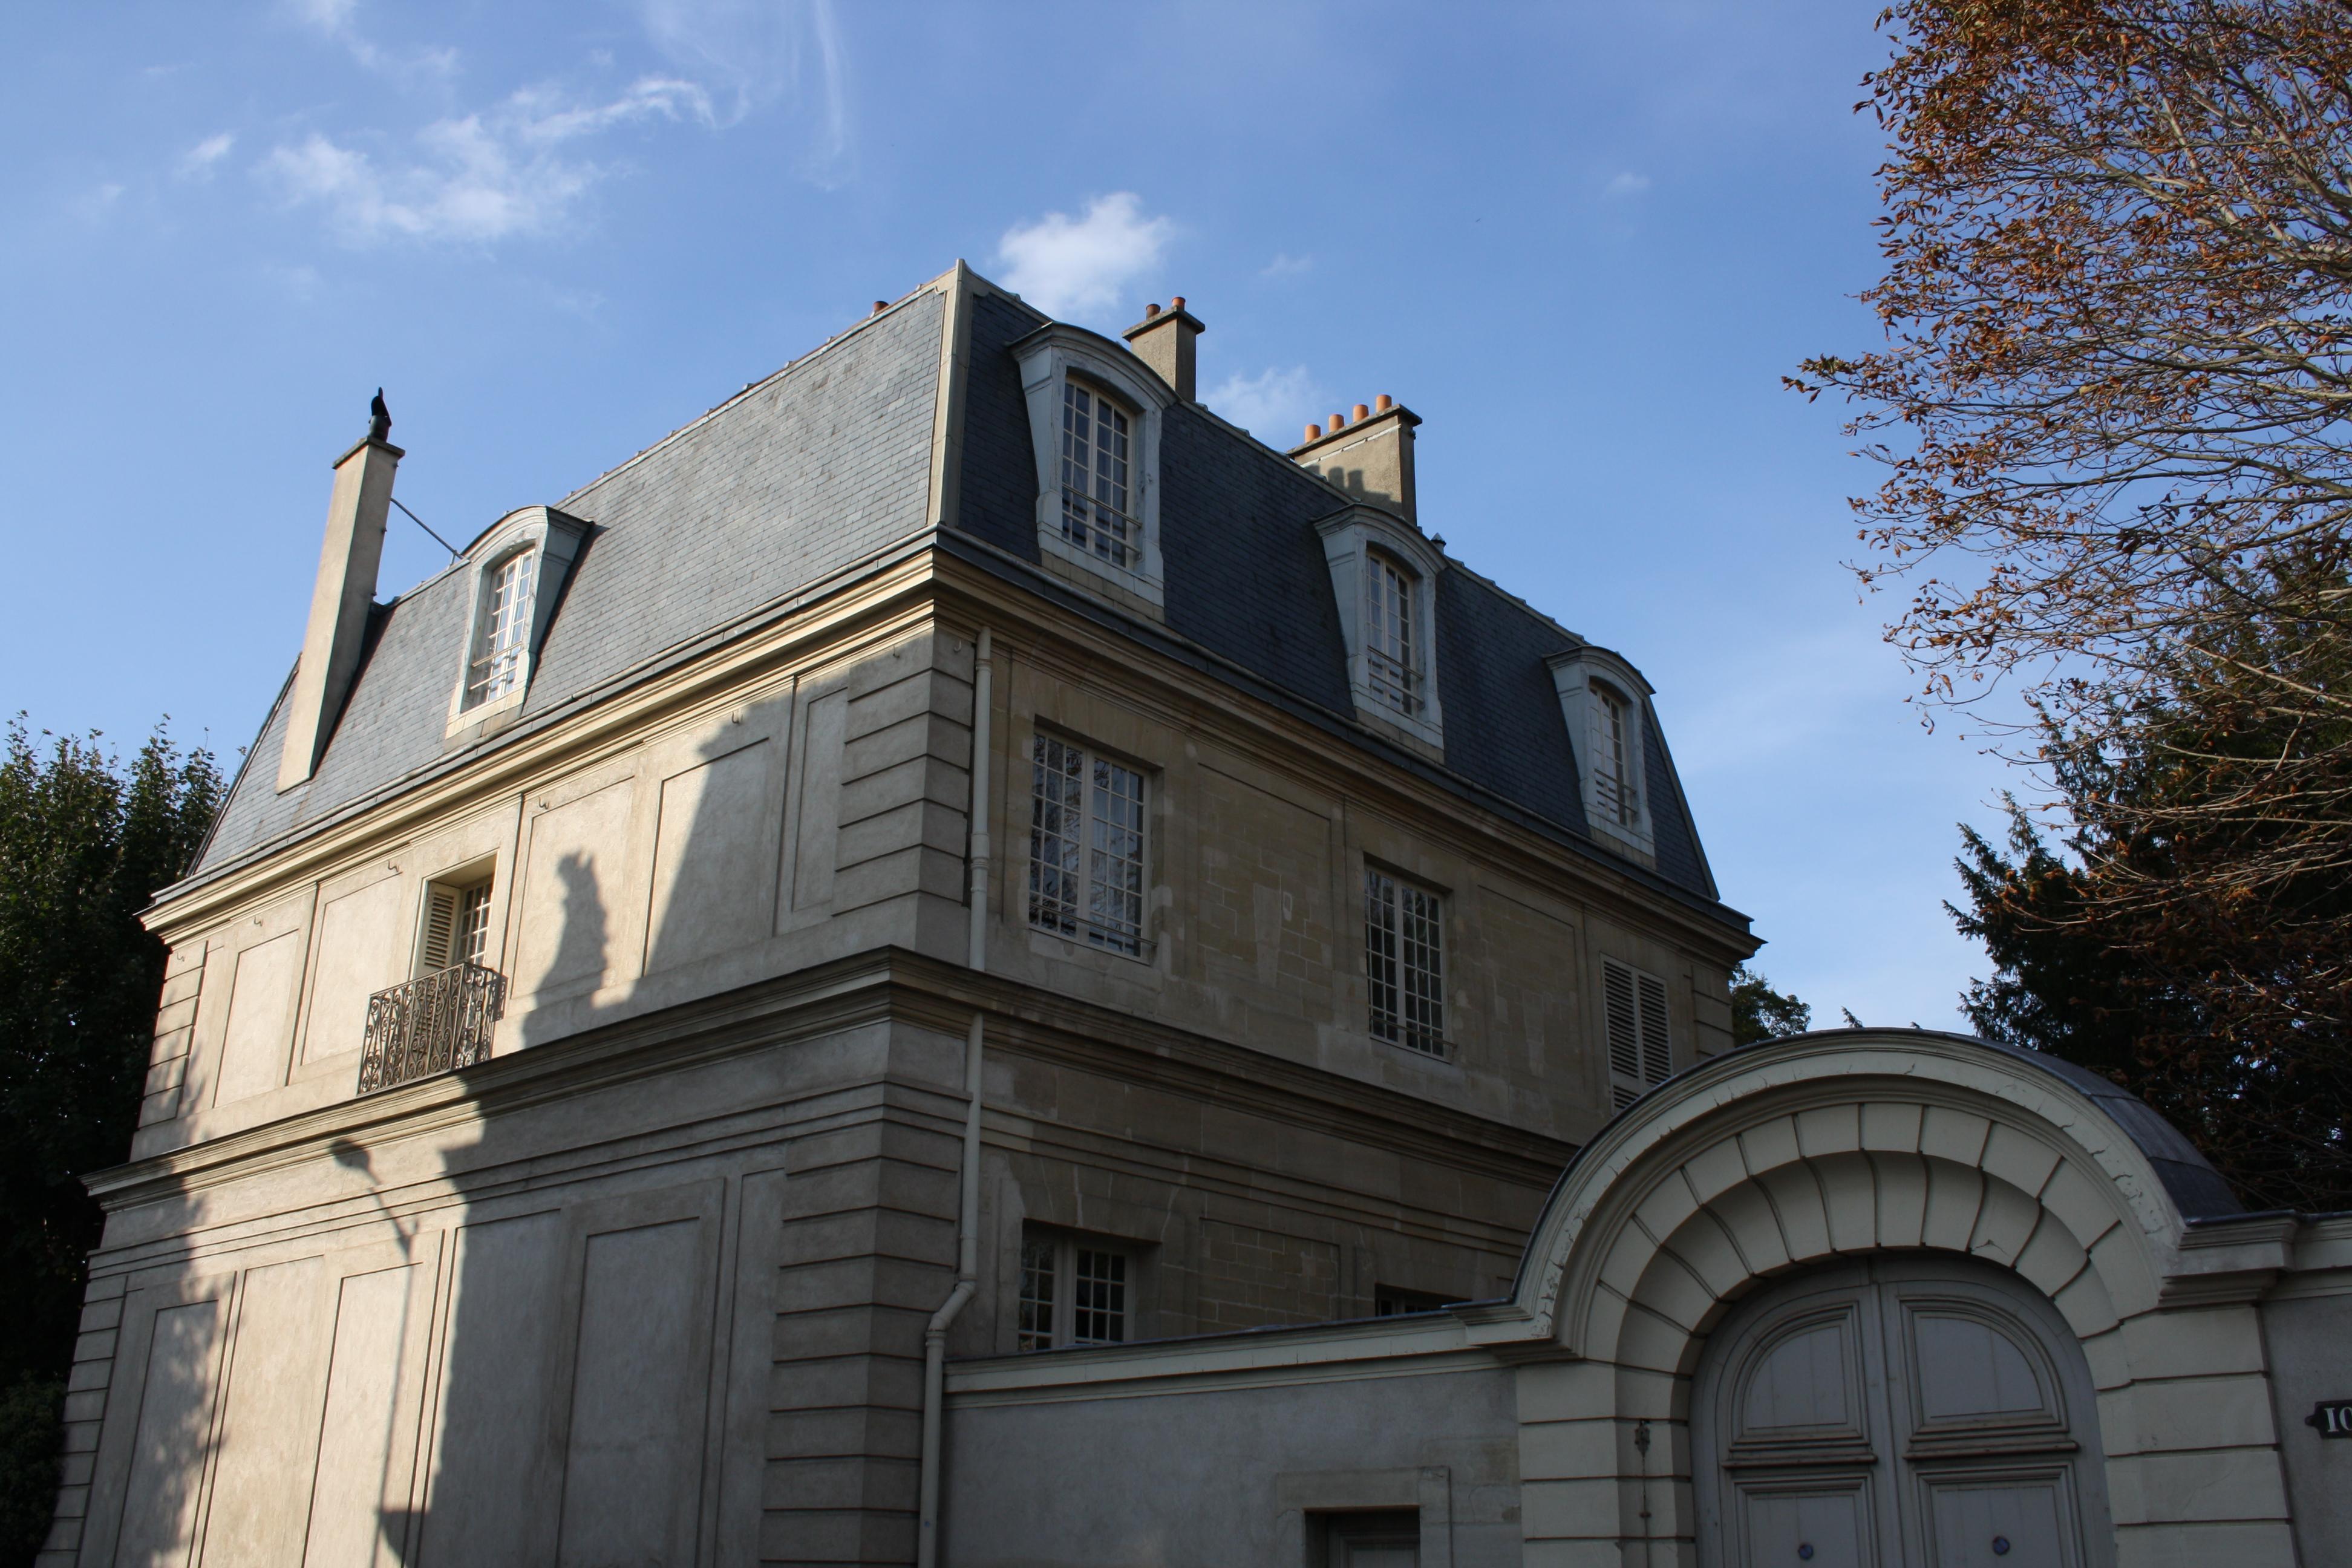 Home St Germain En Laye file:saint-germain-en-laye hôtel de noailles 2011 03